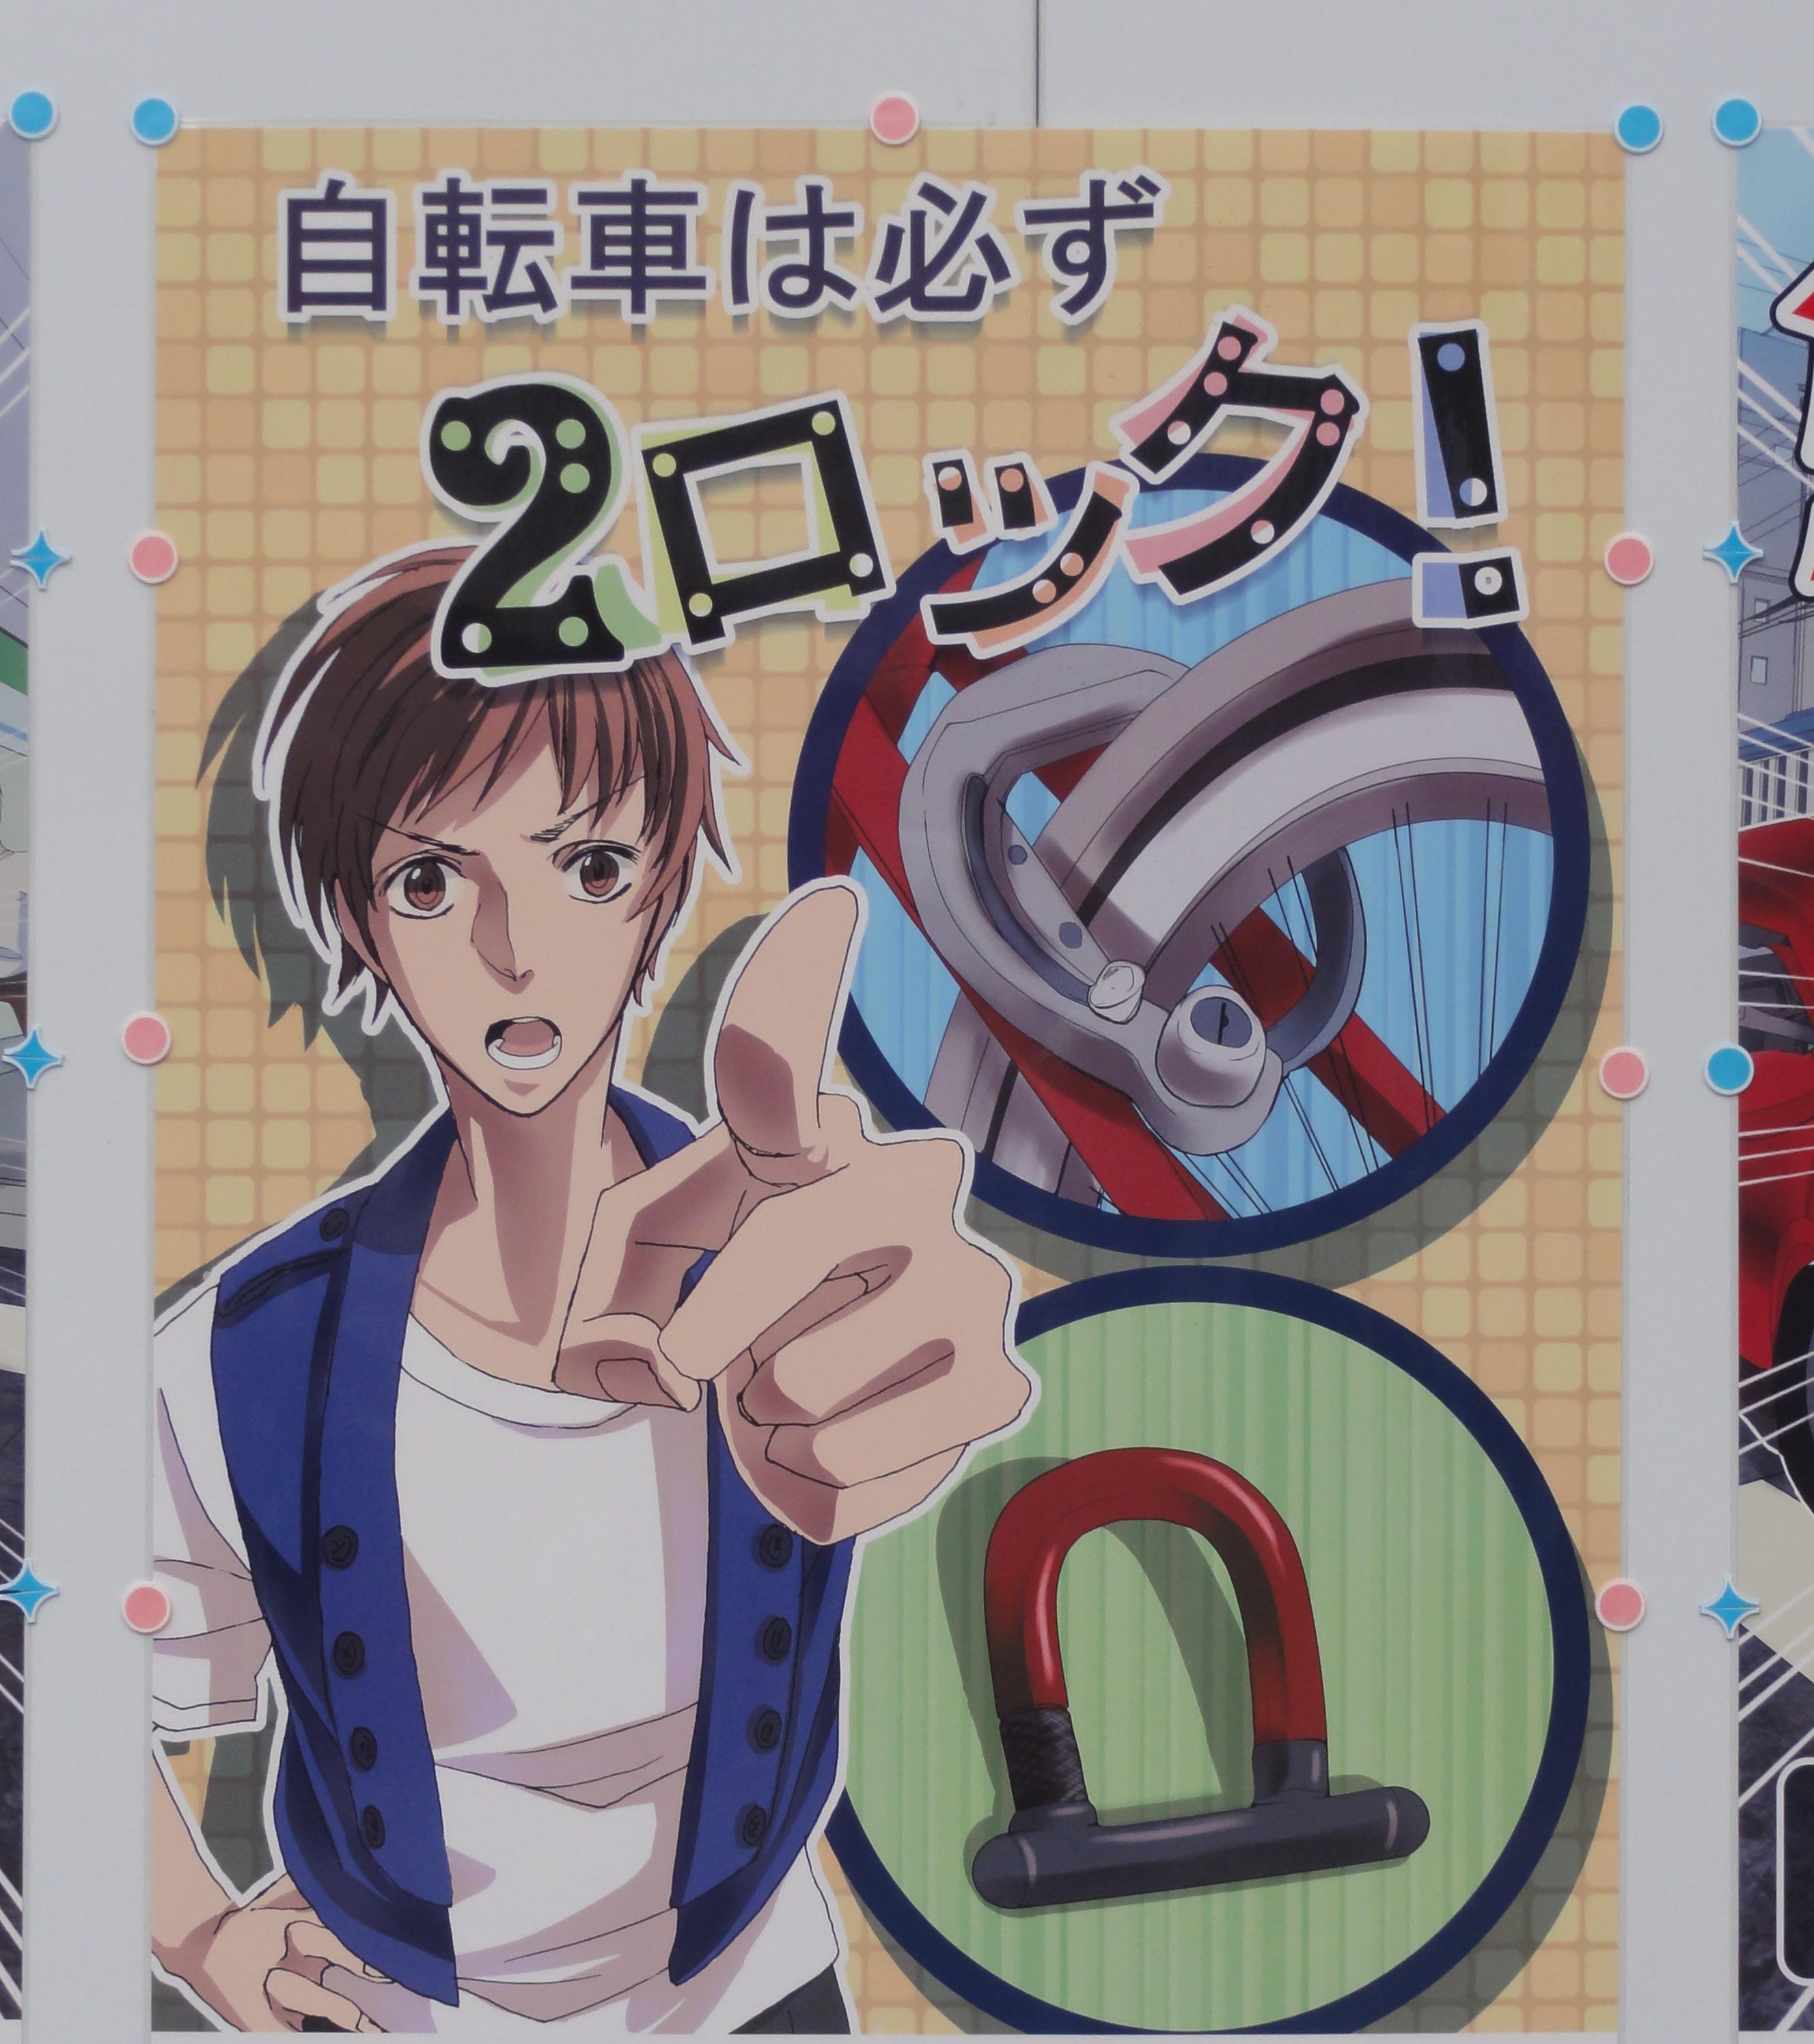 learn-kanji-Japanese-sign-bicycle-lock-255